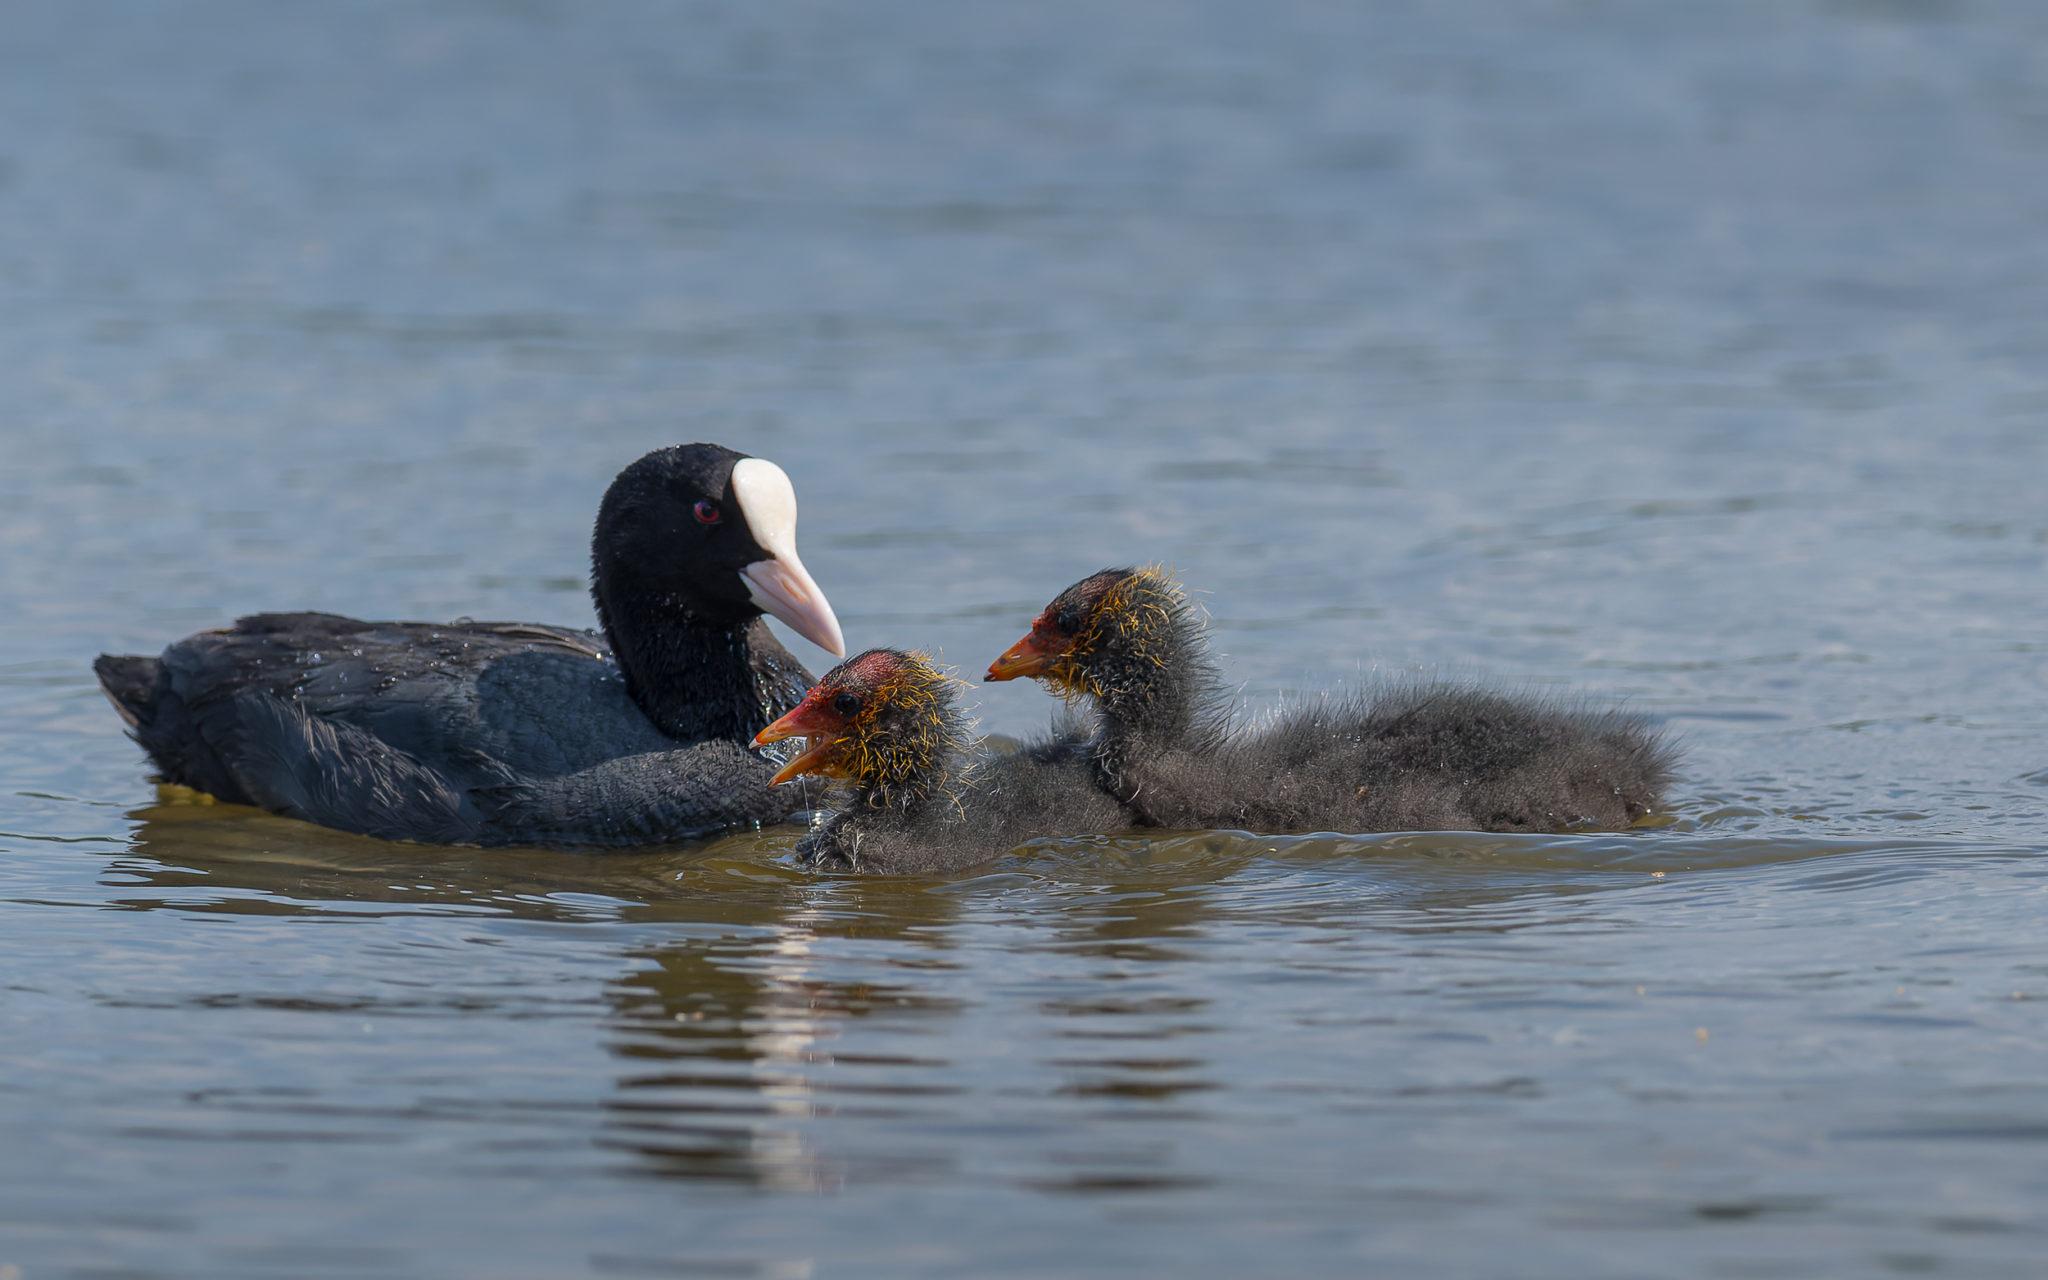 Blässhuhn (Fulica atra) mit Jungtieren, Naturfotografie Olaf & Sylvia Rentzsch